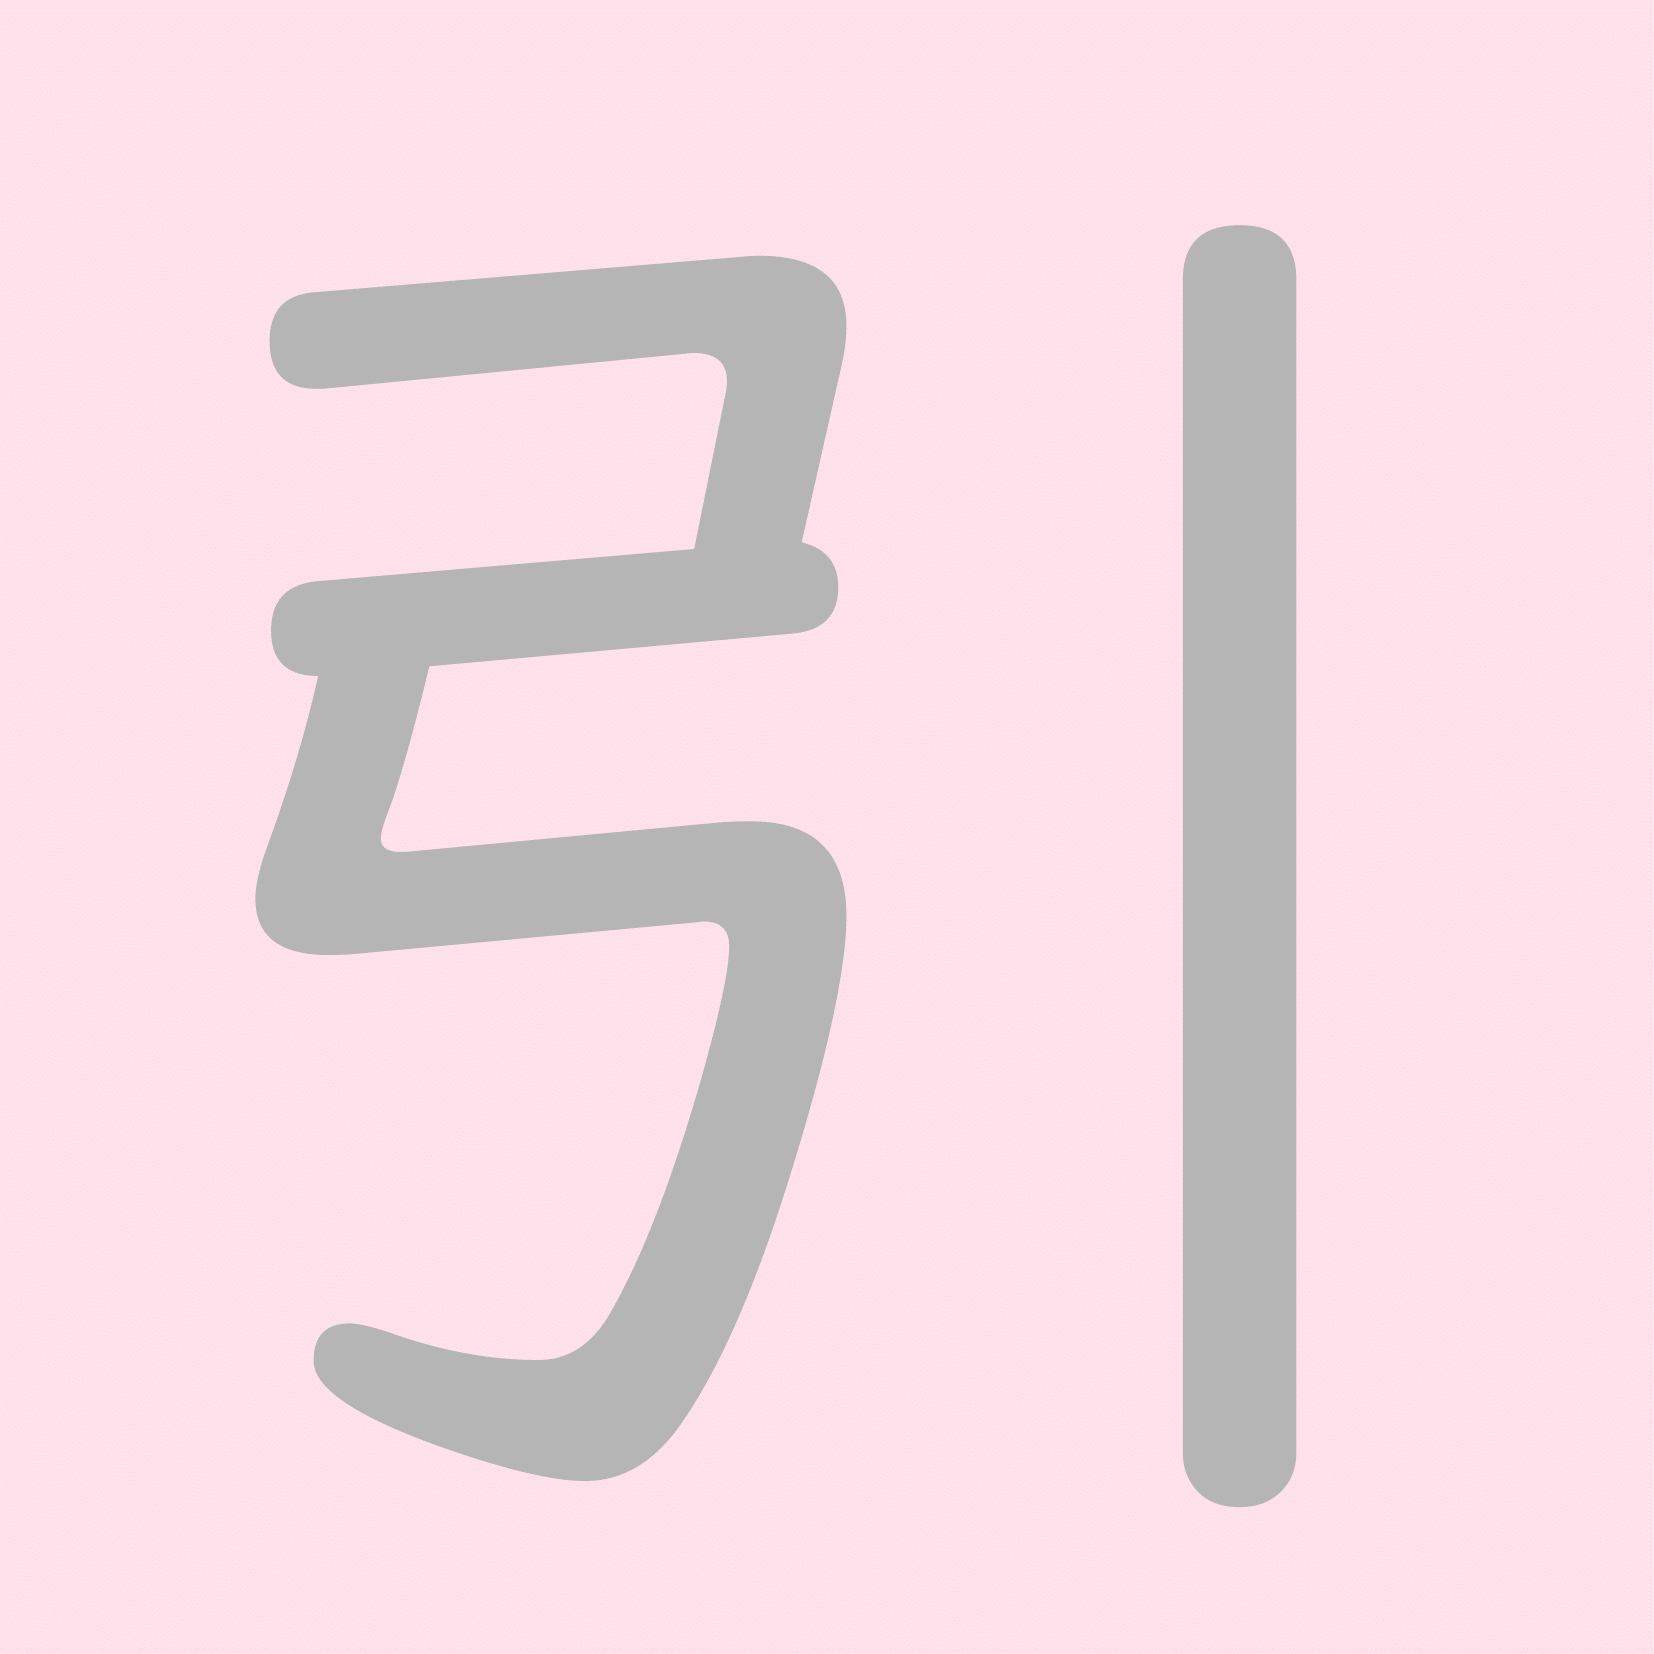 C020CARDkanji_2ndGradegrayn-001